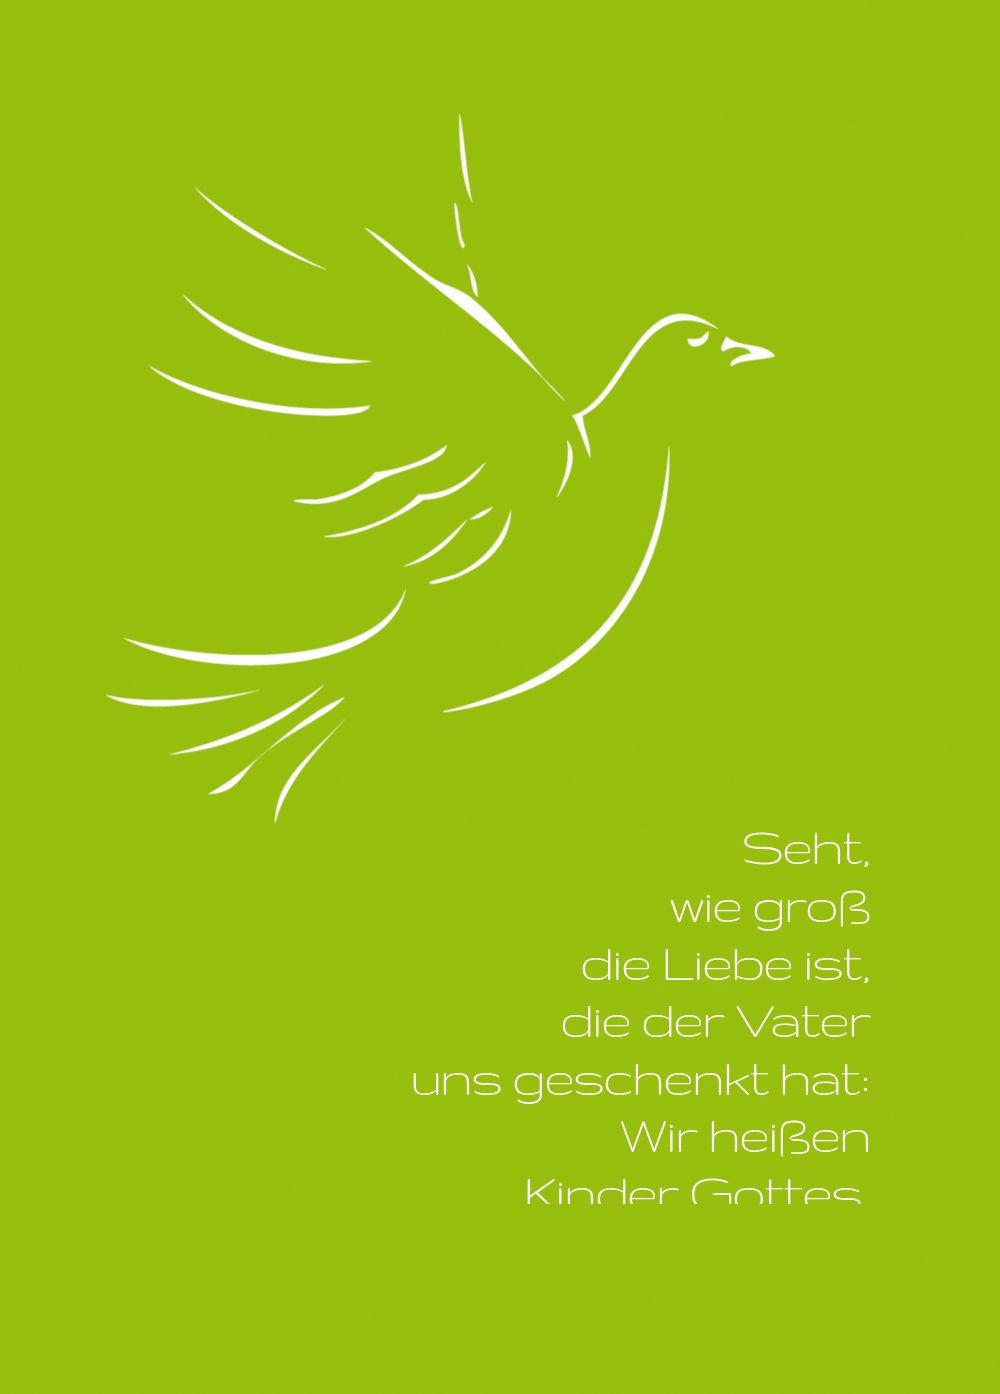 Ansicht 2 - Firmkarte Pigeon